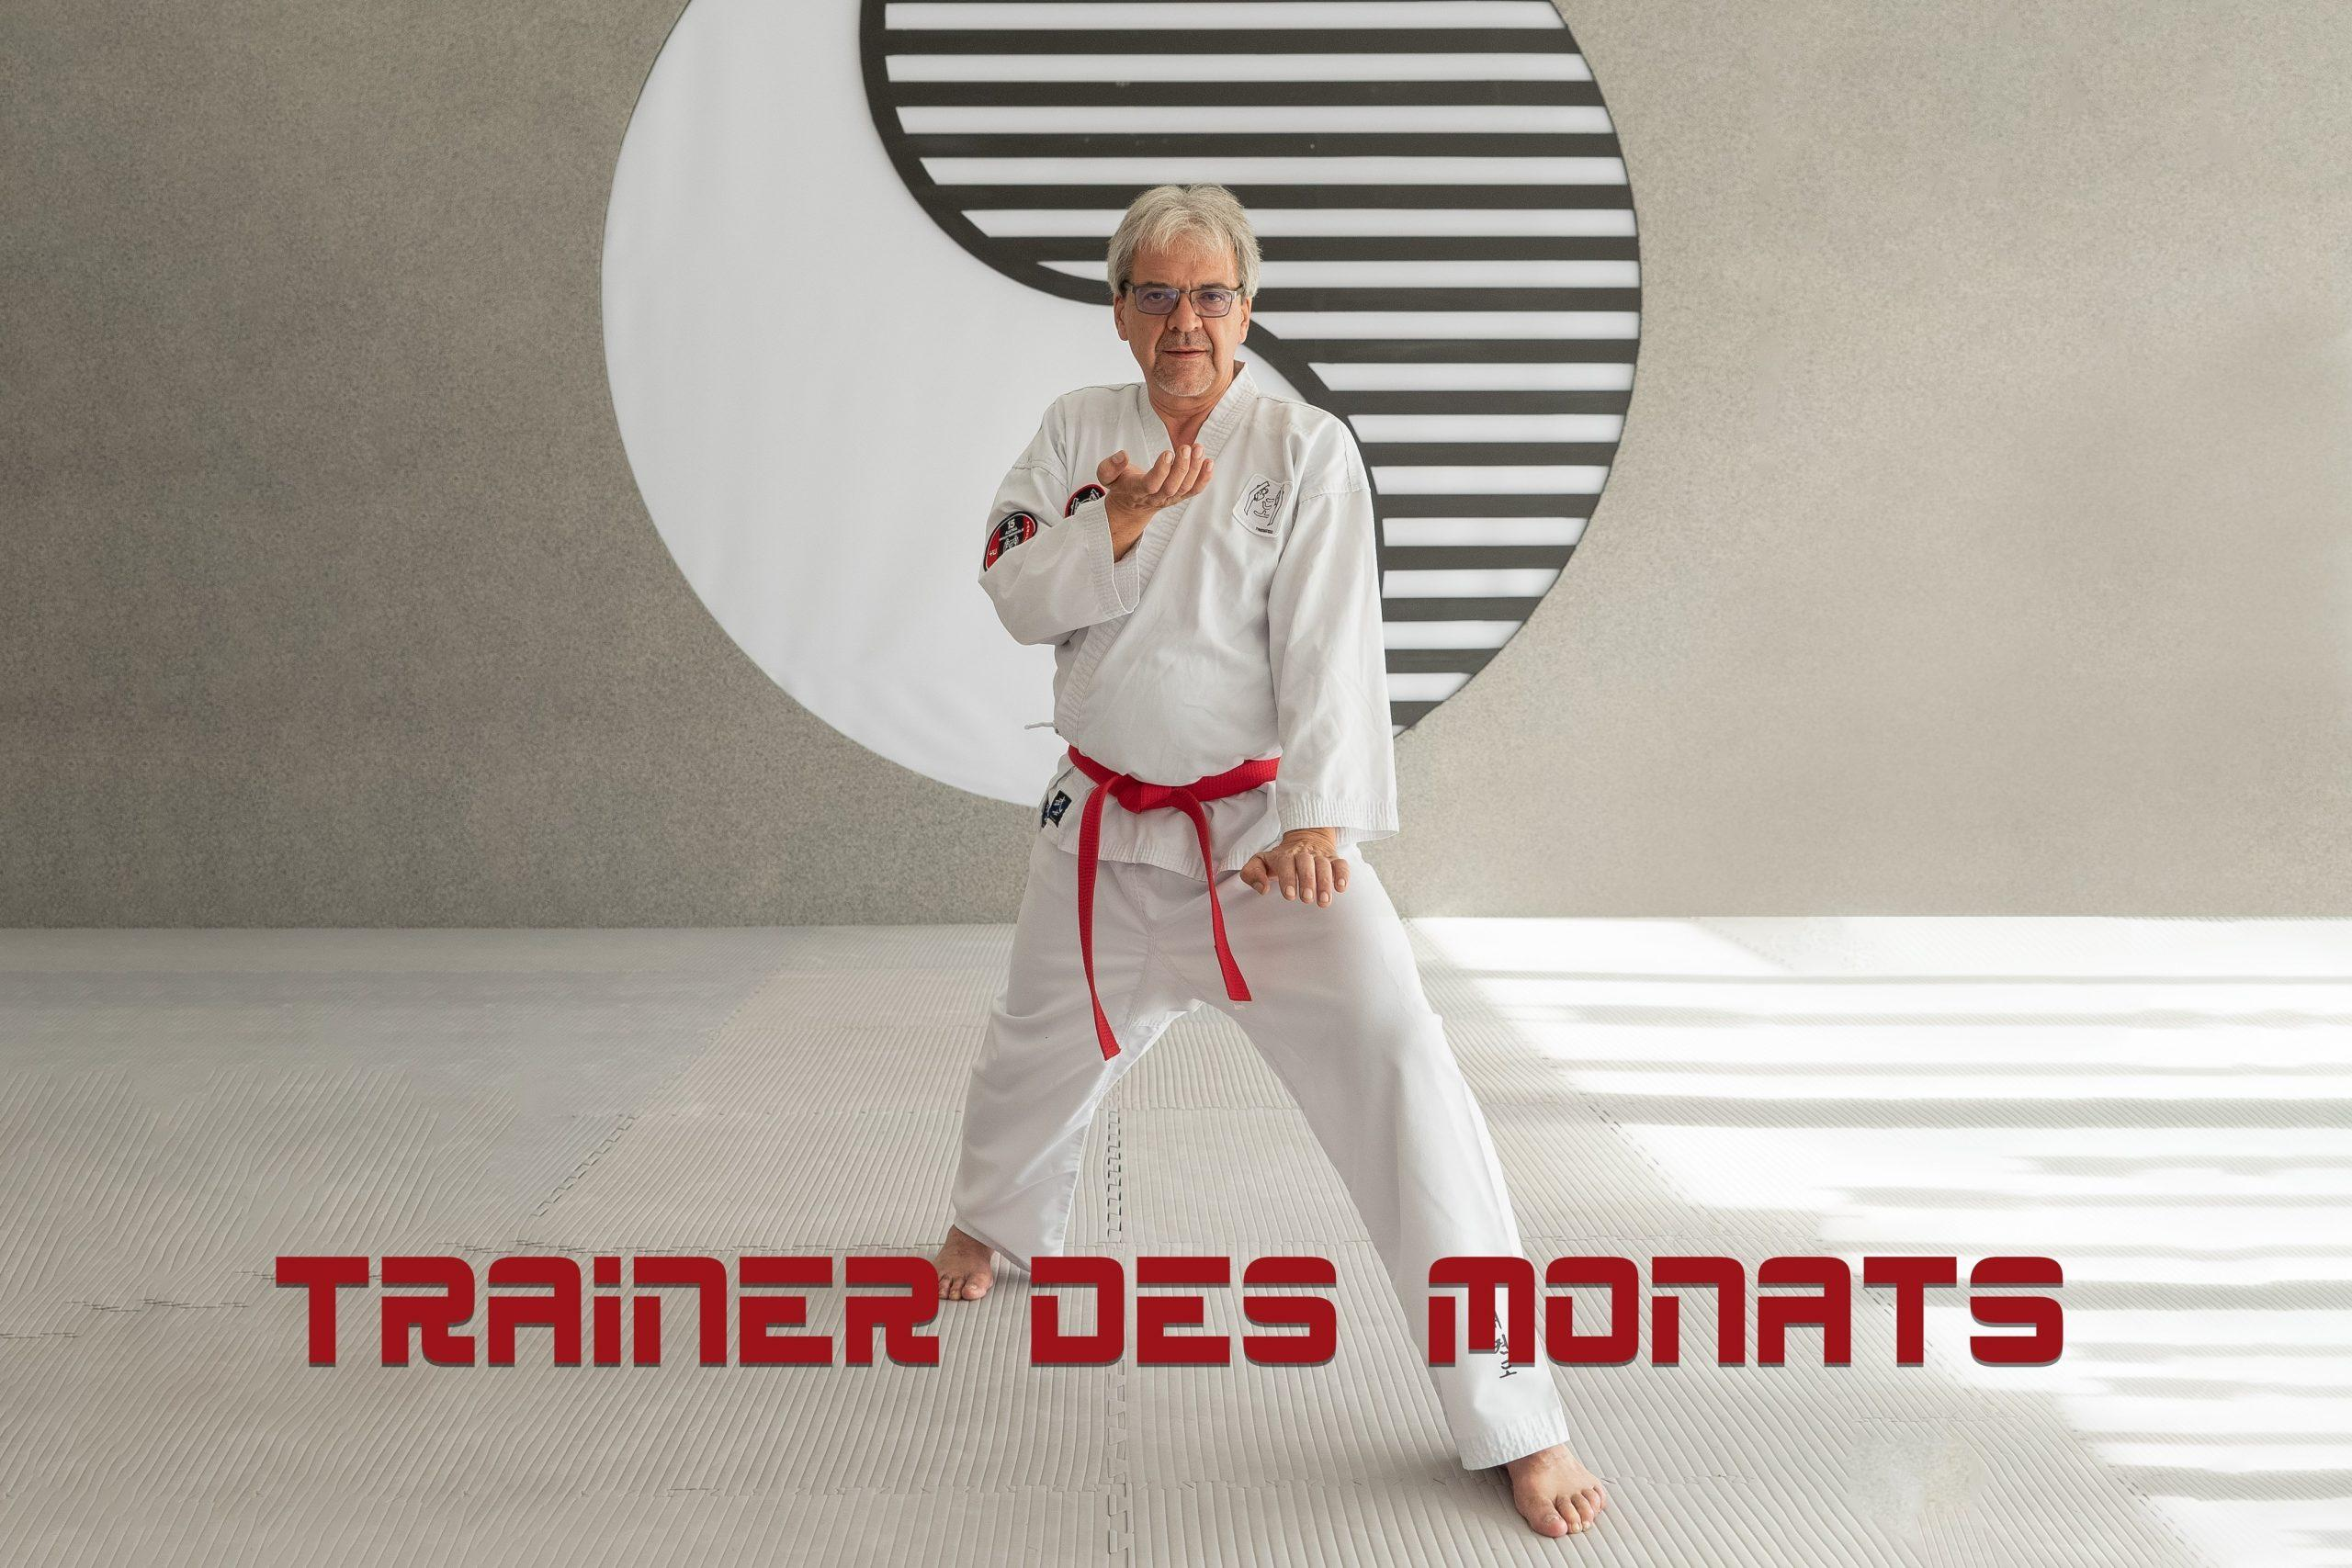 YOUNG-UNG Taekwondo Trainer des Monats Wolfgang Schanik-Vysata